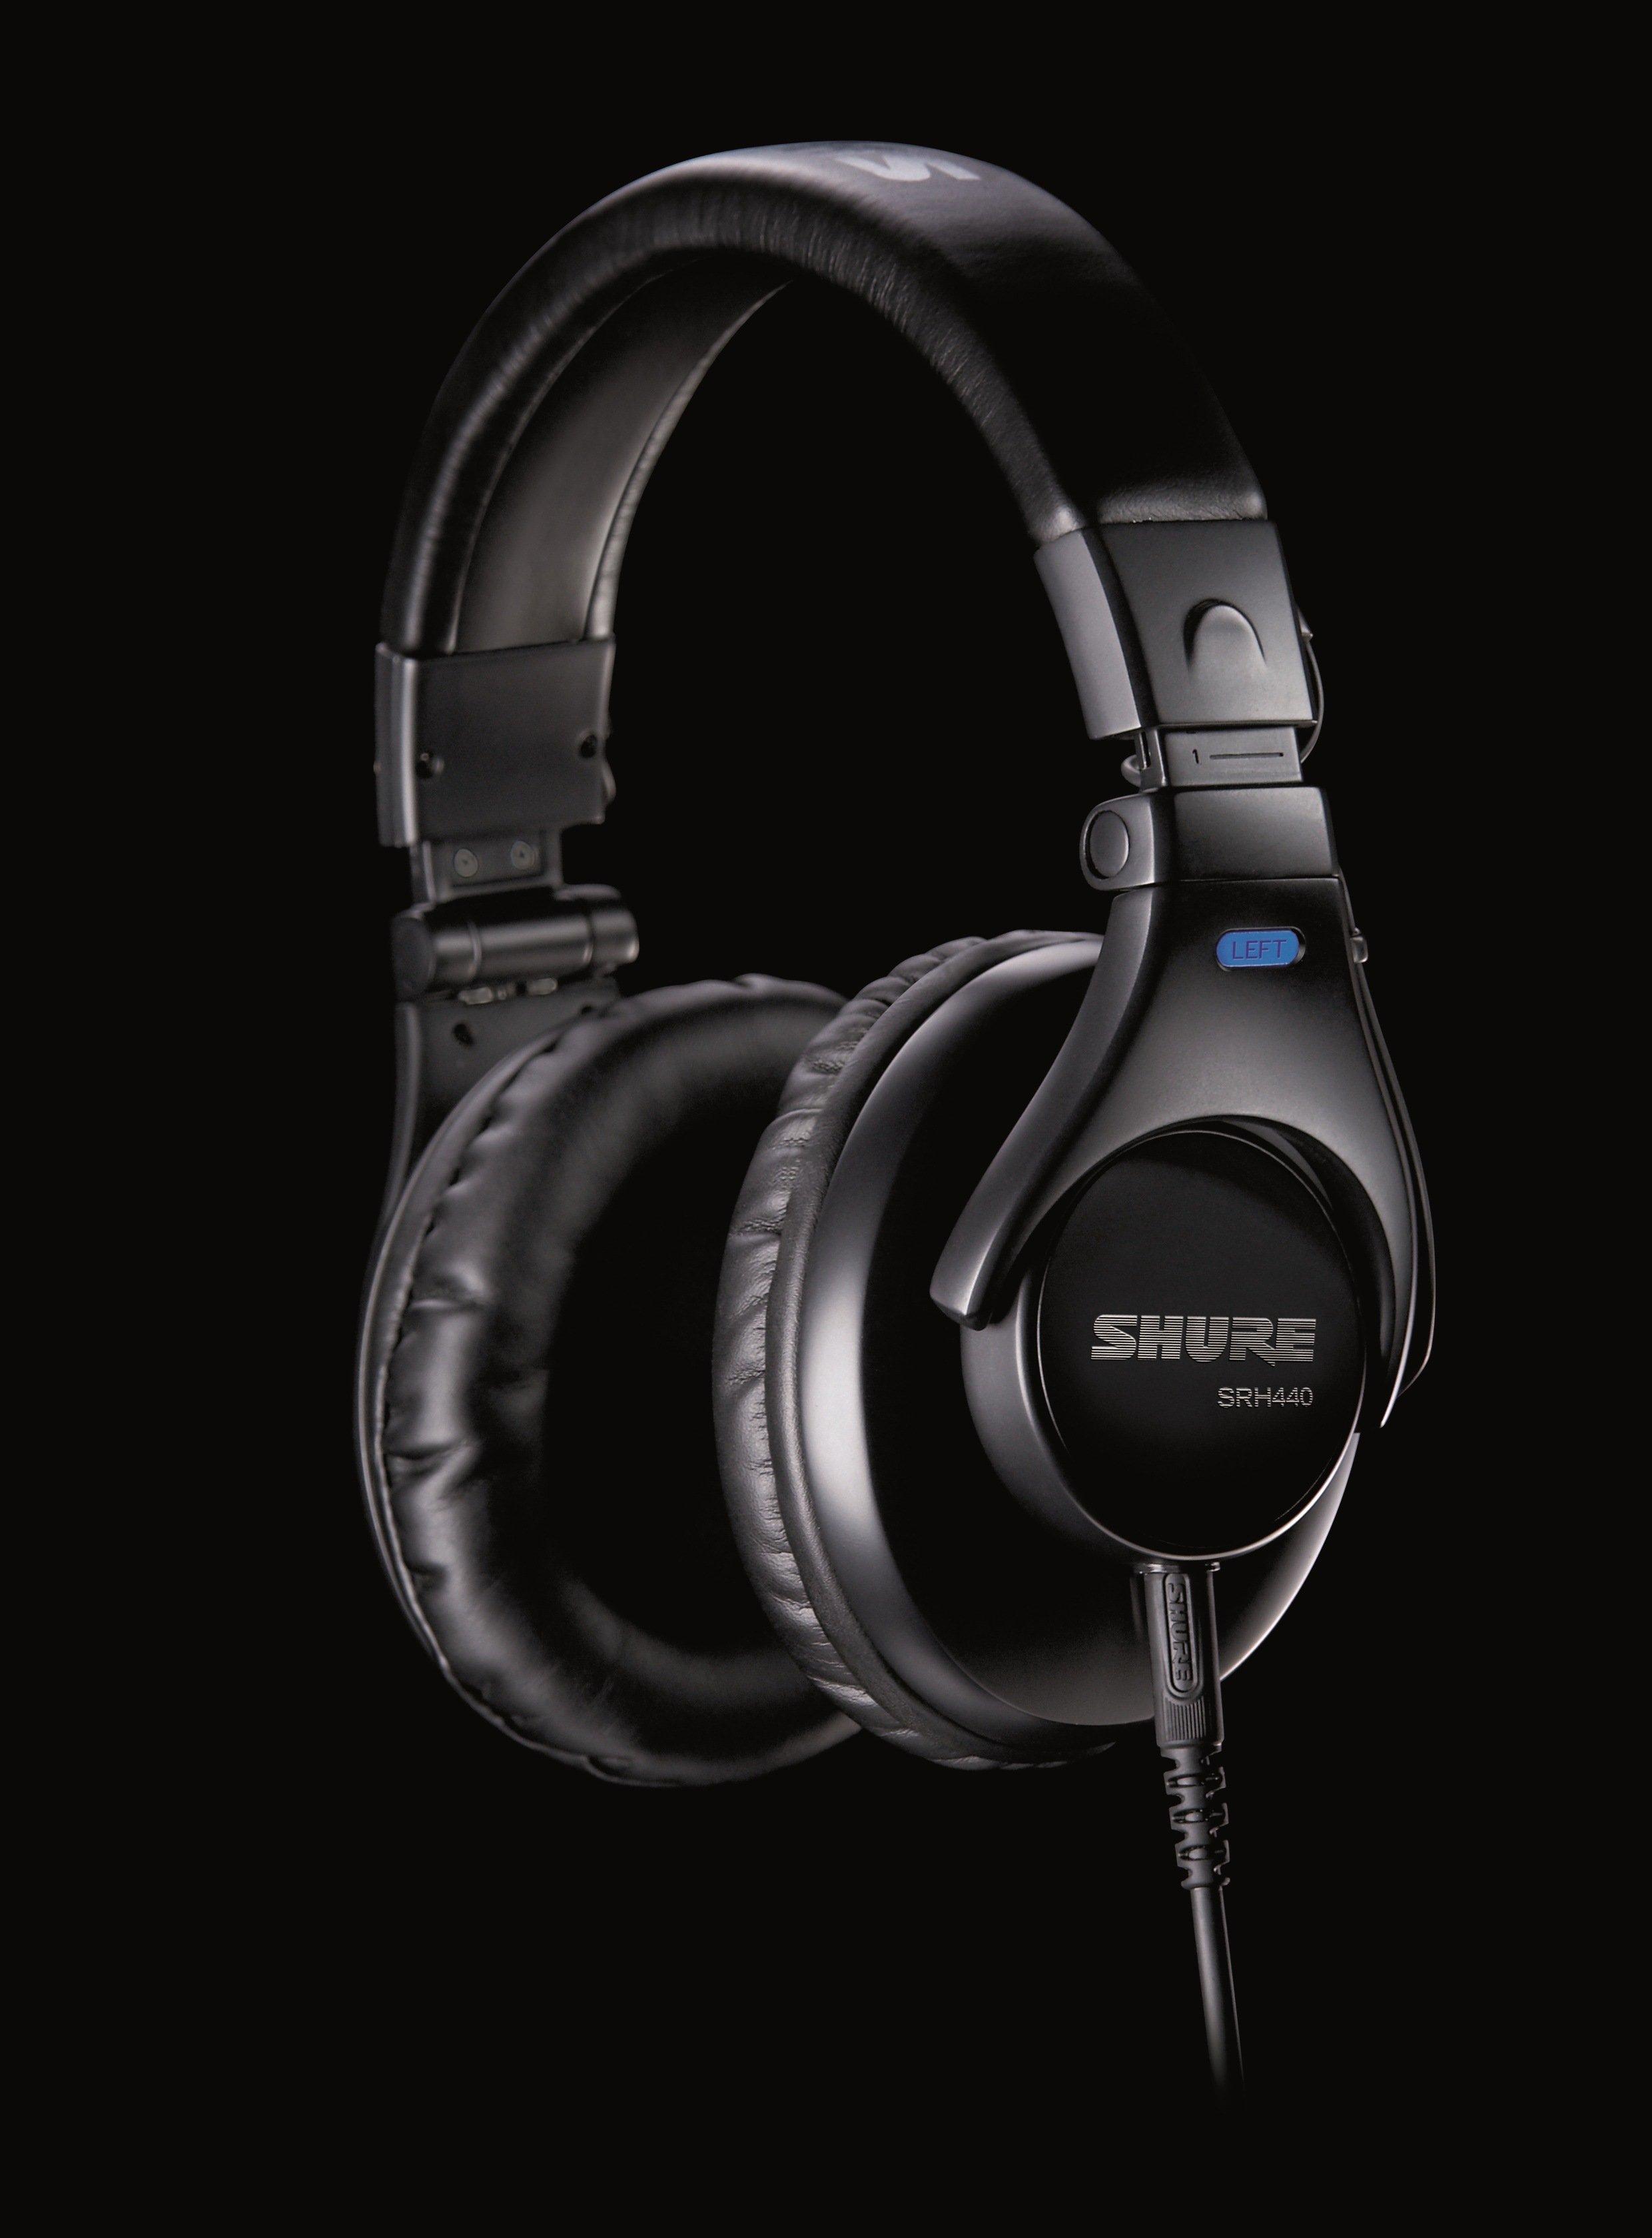 Amazon.com: Shure SRH440 Professional Studio Headphones